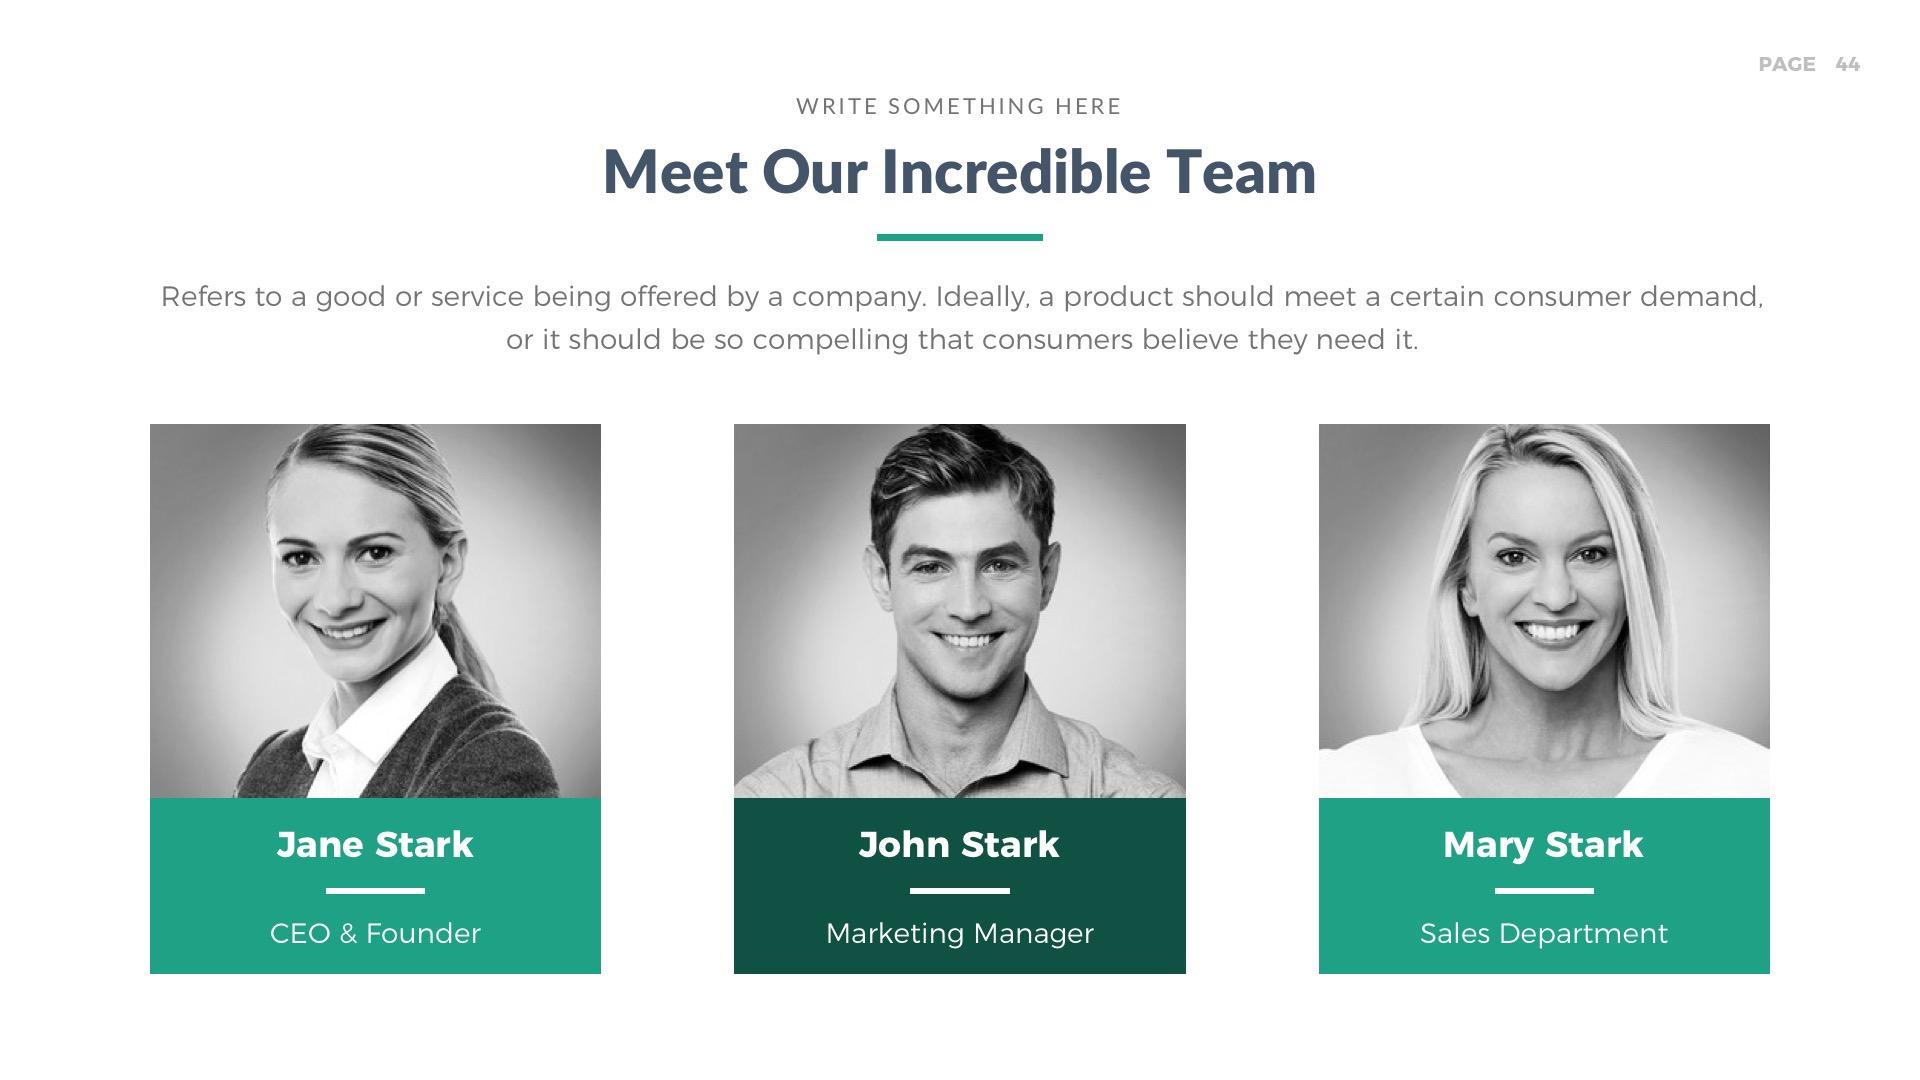 Horizon Business Pitch Deck PowerPoint Template by LouisTwelve-Design